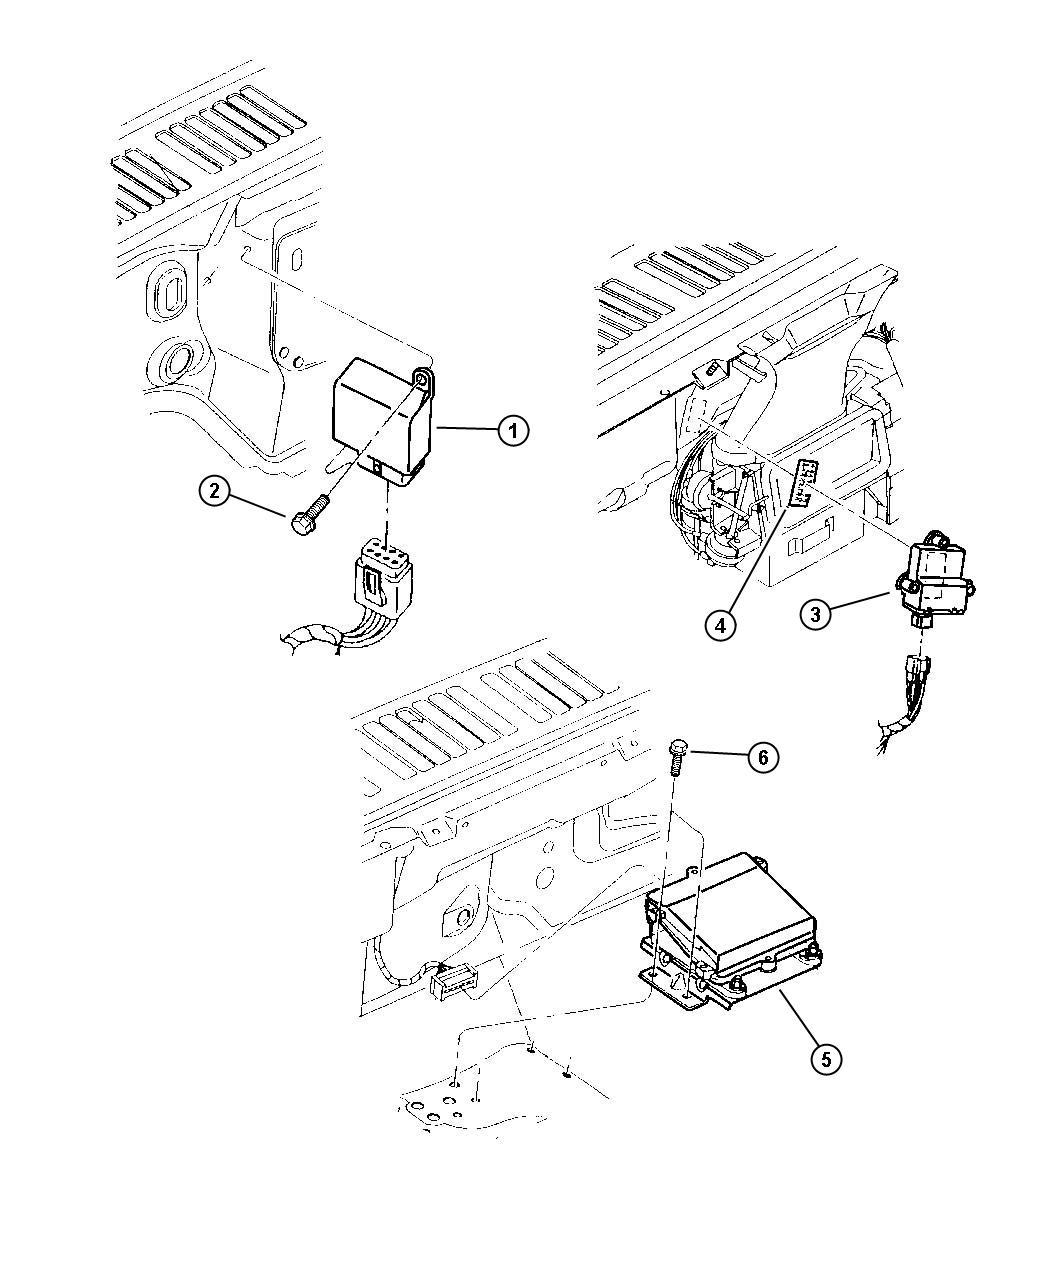 1999 Jeep Wrangler Module. Security alarm. Key, sentry